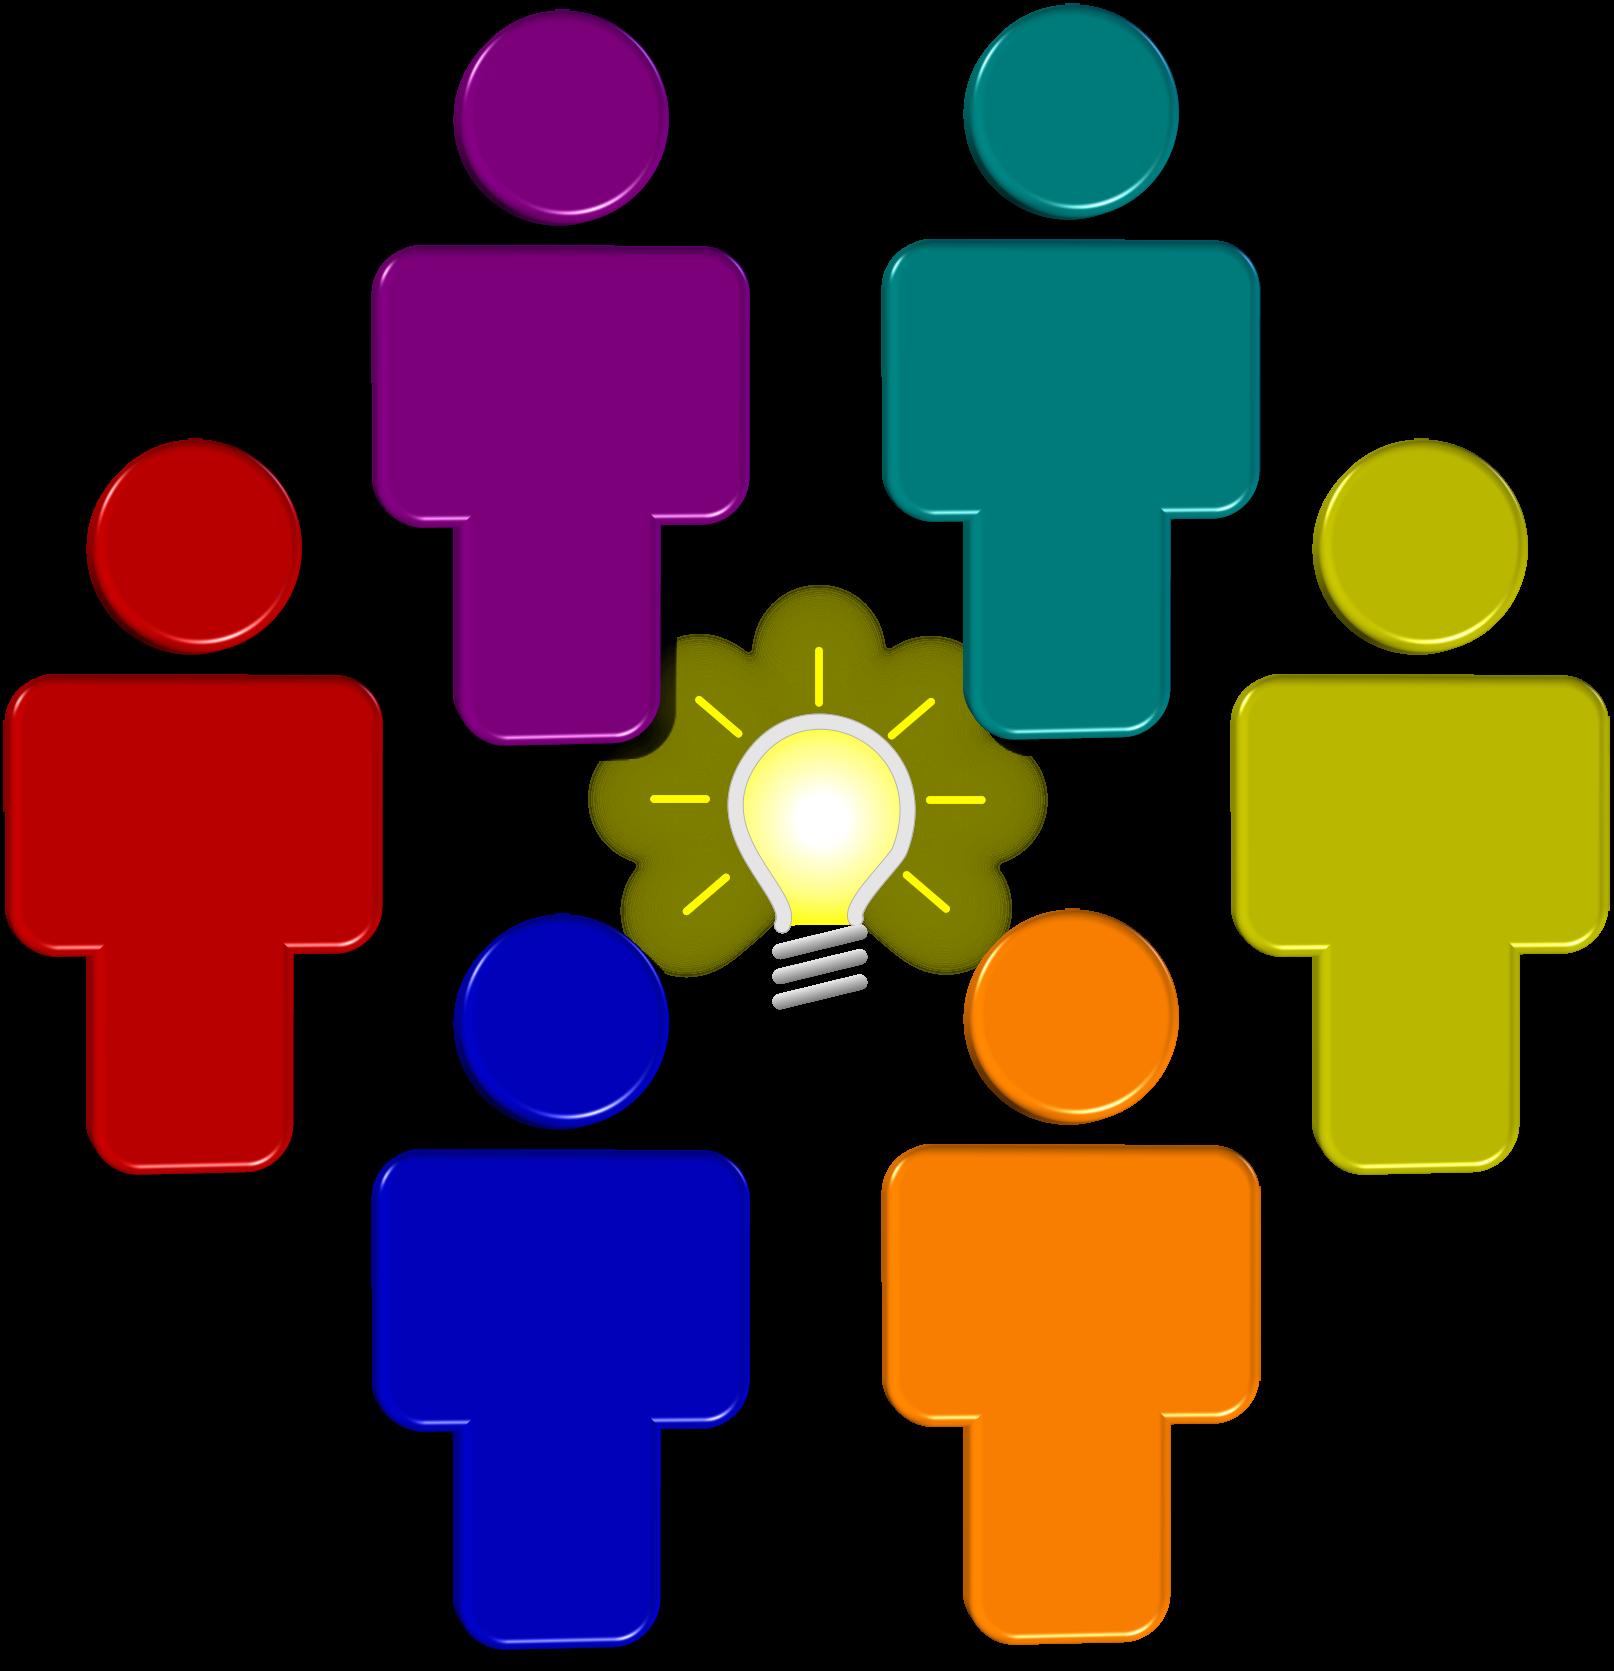 Tumourtextract health language analytics. Collaboration clipart research team